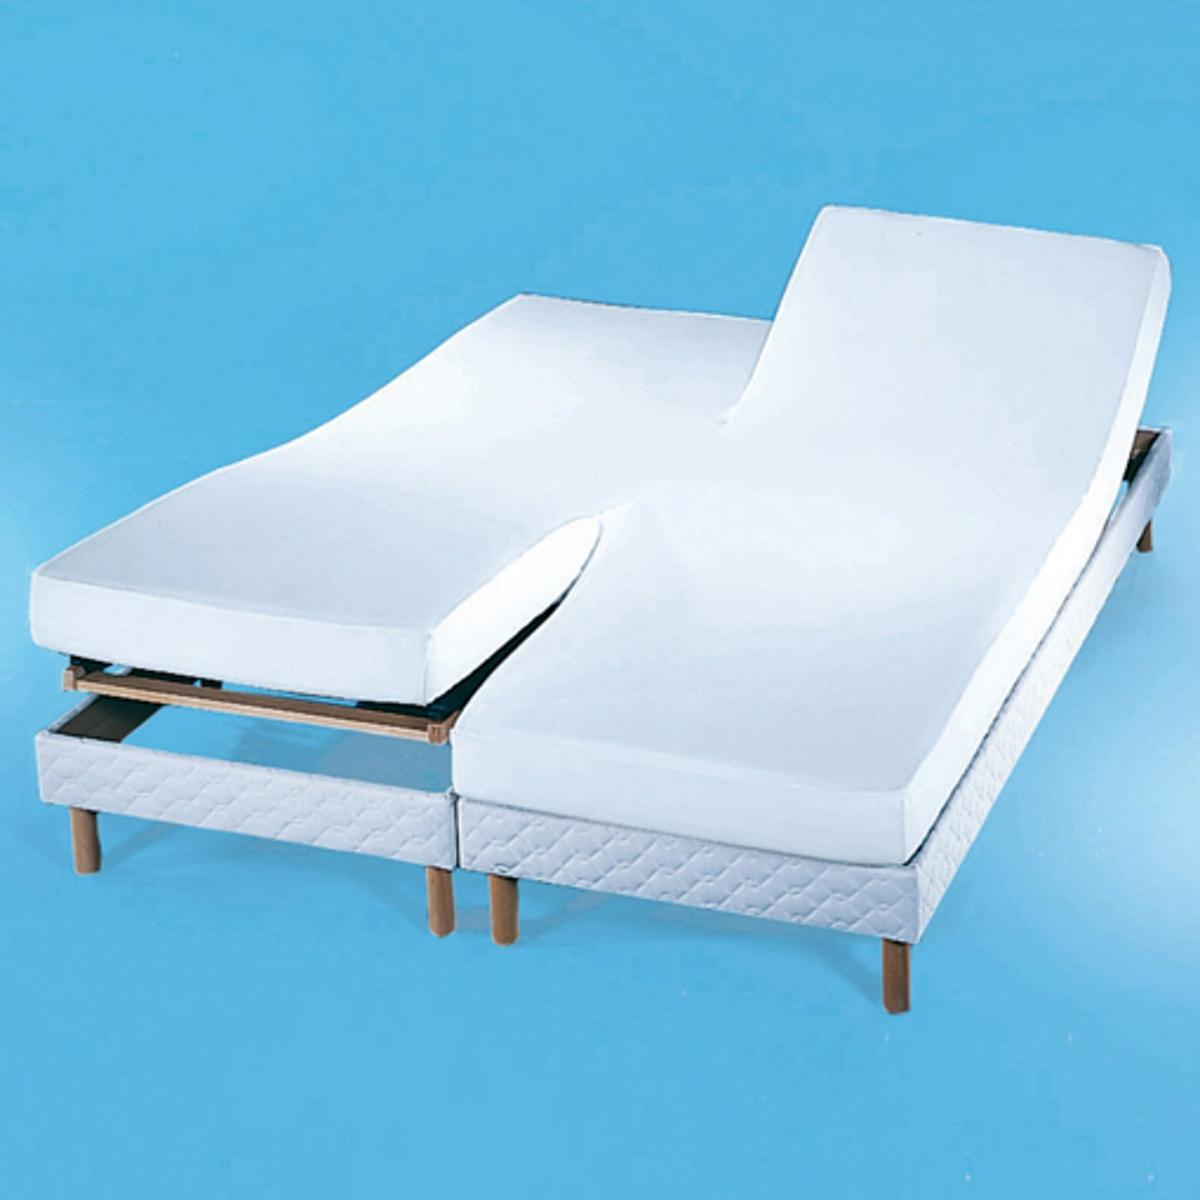 Чехол защитный для спаренных матрасов, 220 г/м² чехол защитный на матрас из мольтона 220 г м²